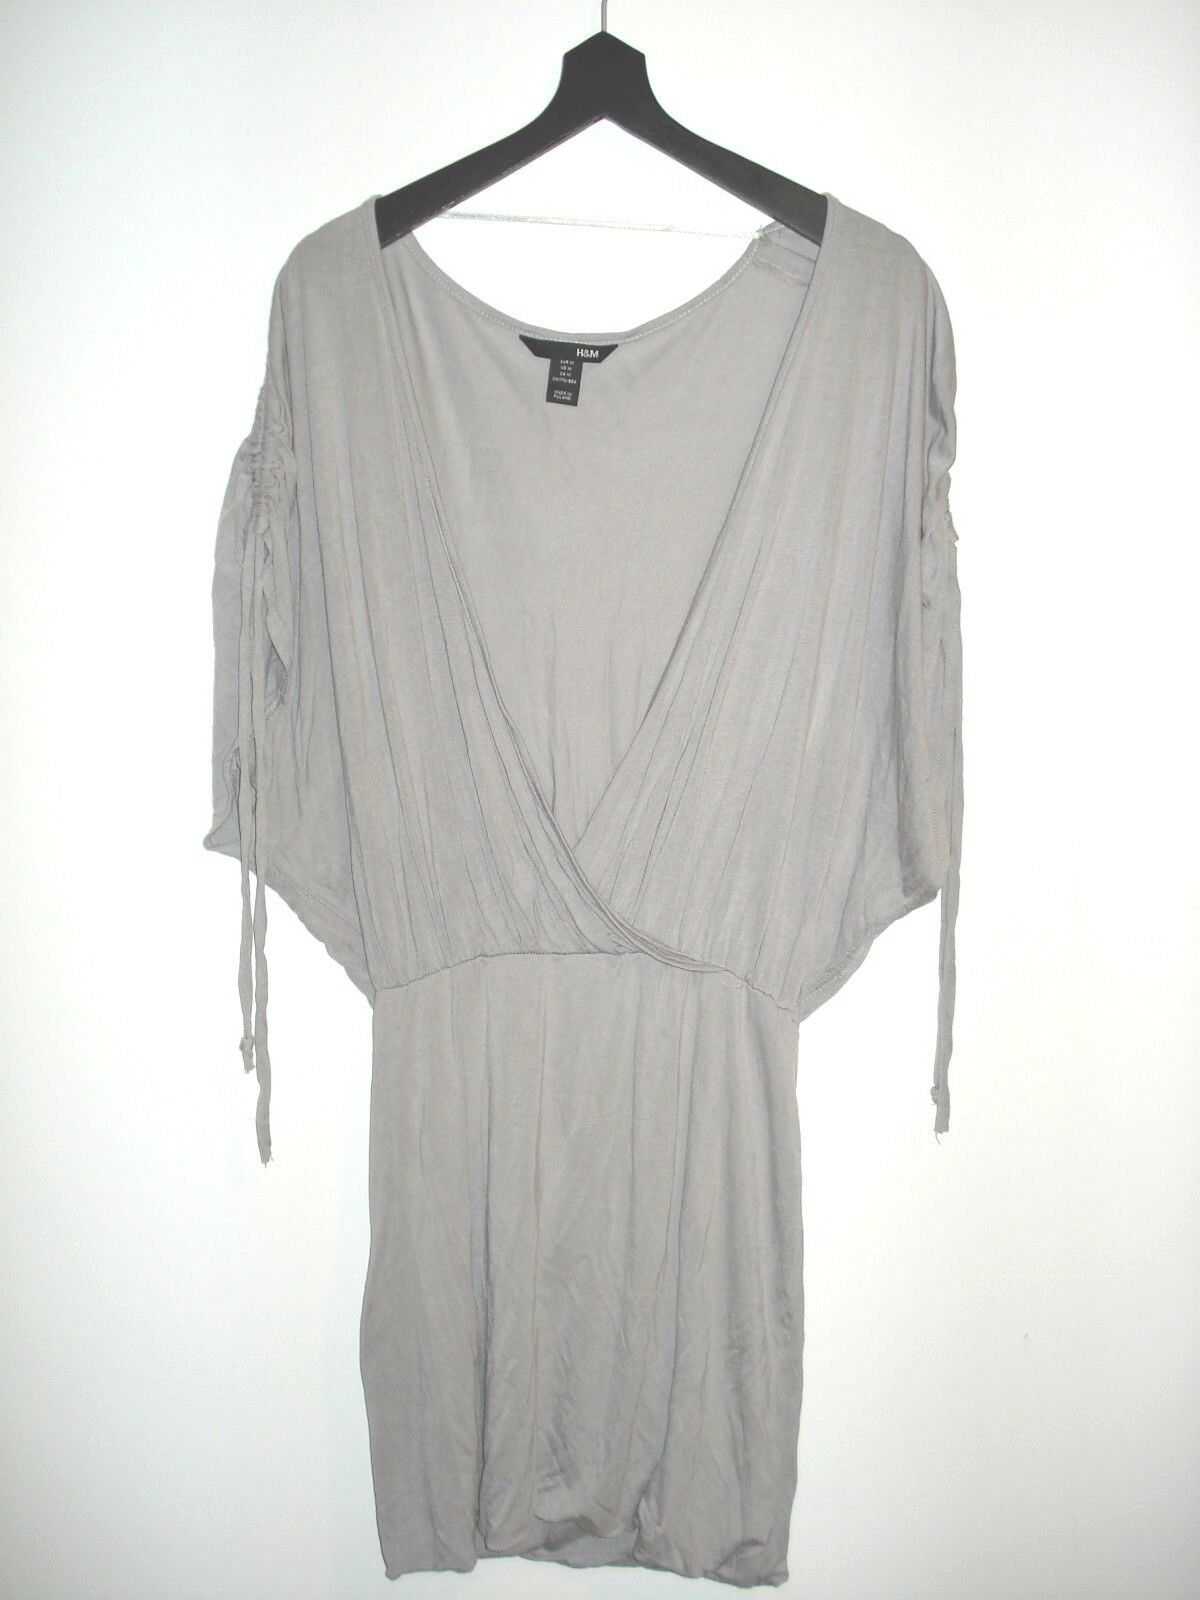 H&M Dress Tunic LOW Open FRONT Light grau Größe M Free Shipping